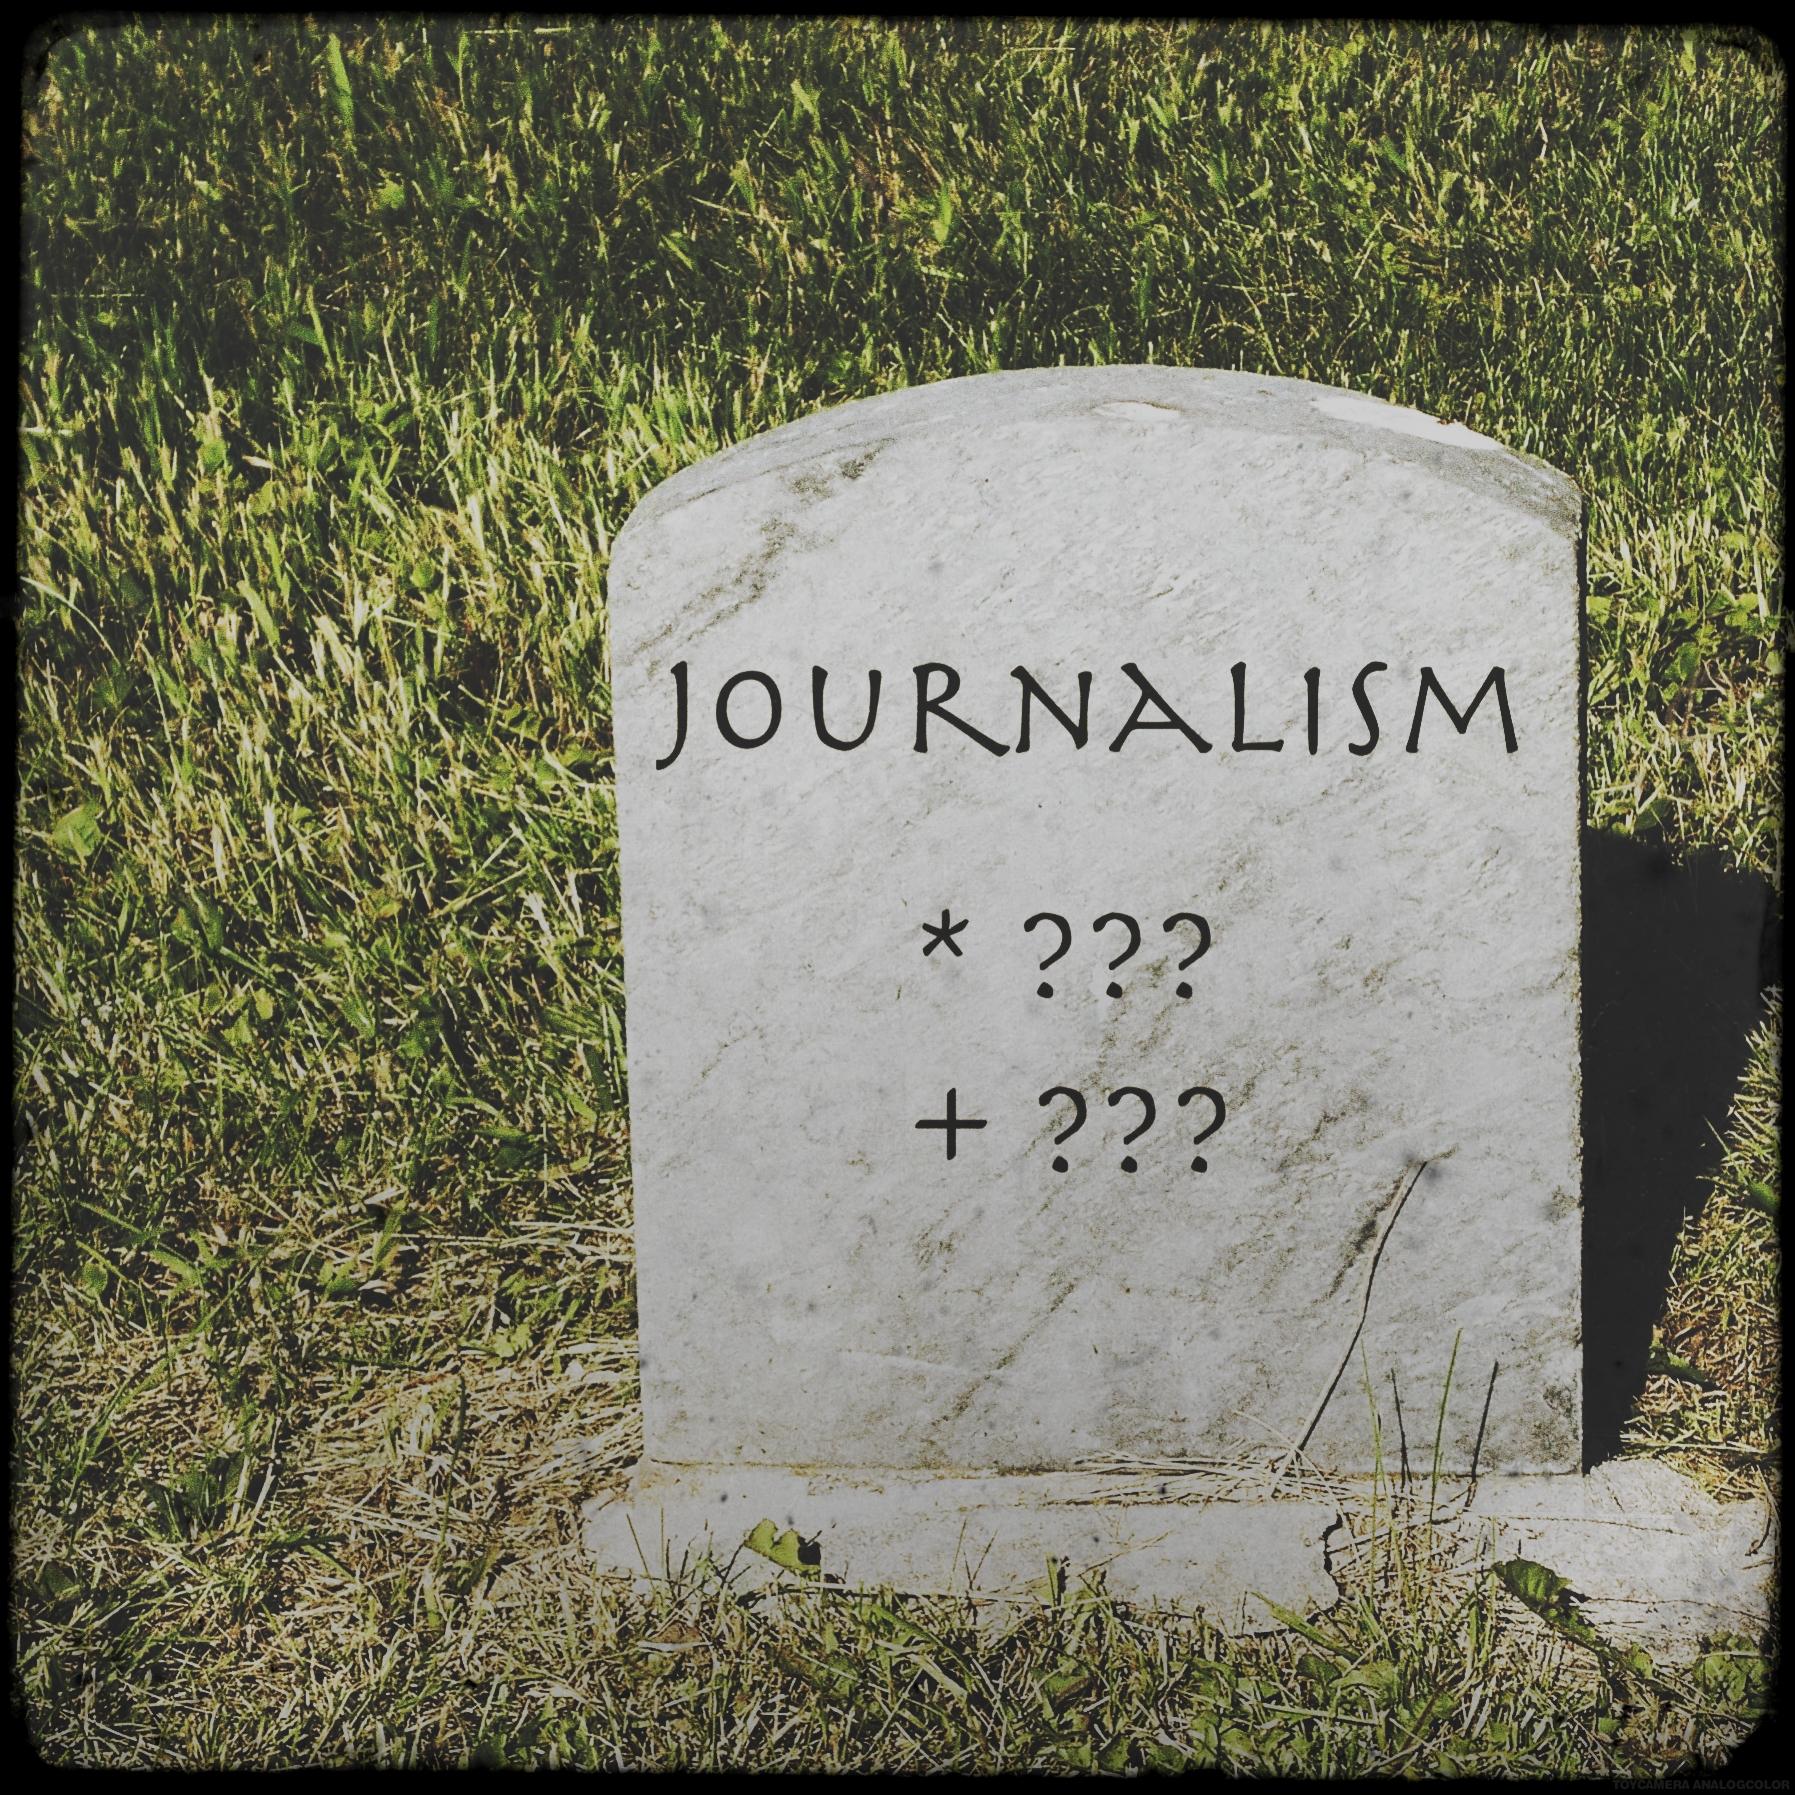 Journalism isn't finished yet - Bernhard Lill replies to Michael Rosenblum